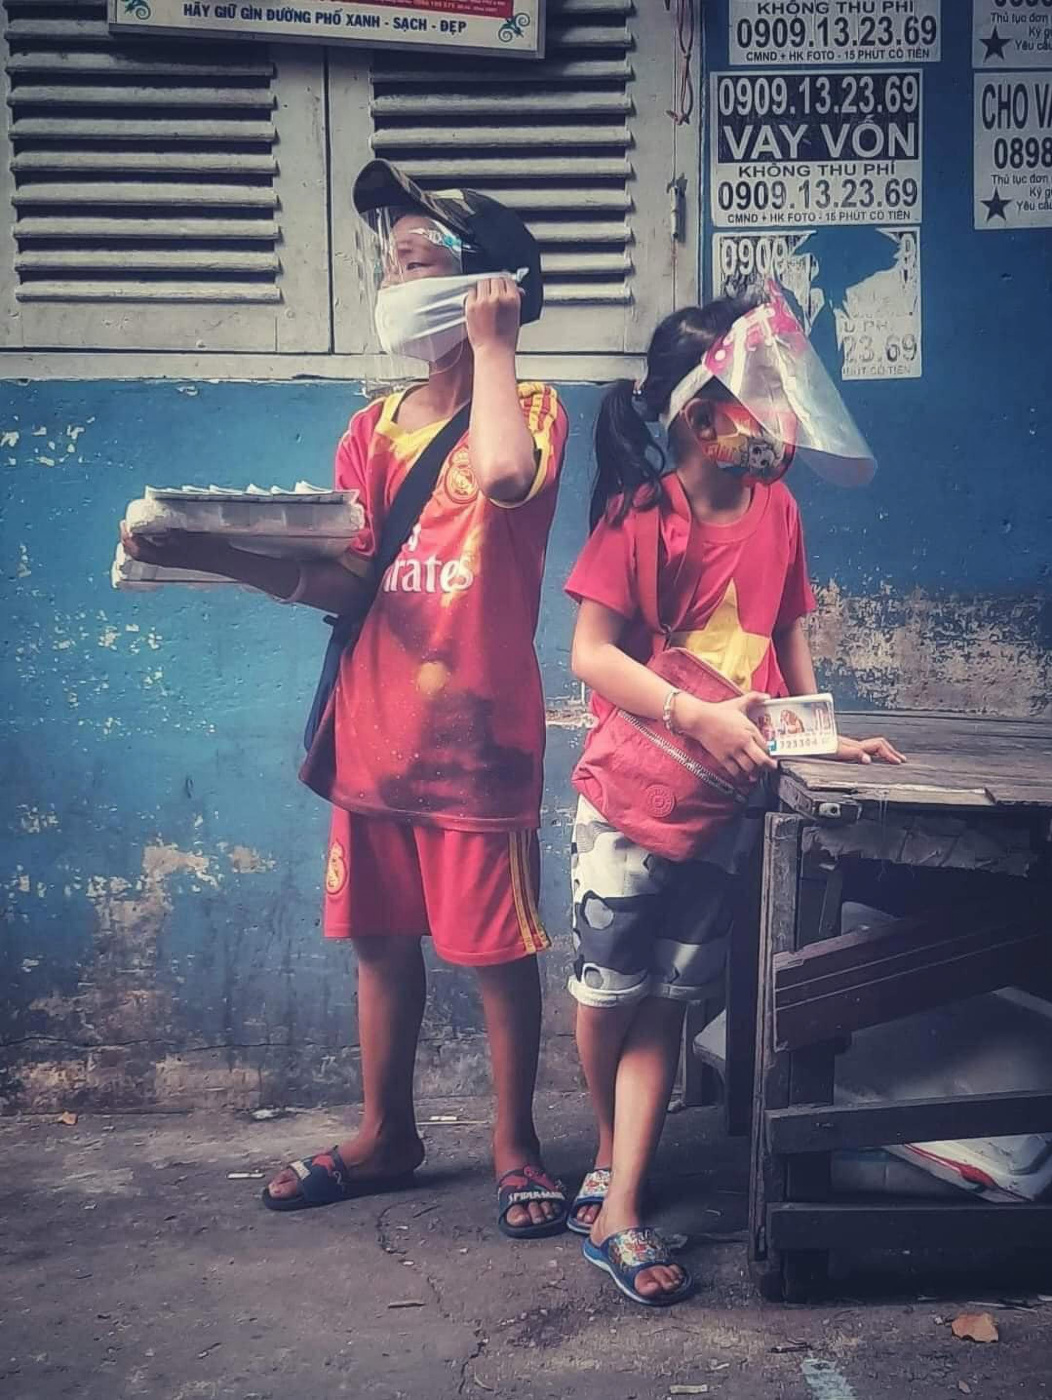 Pham Yen. Two poor children